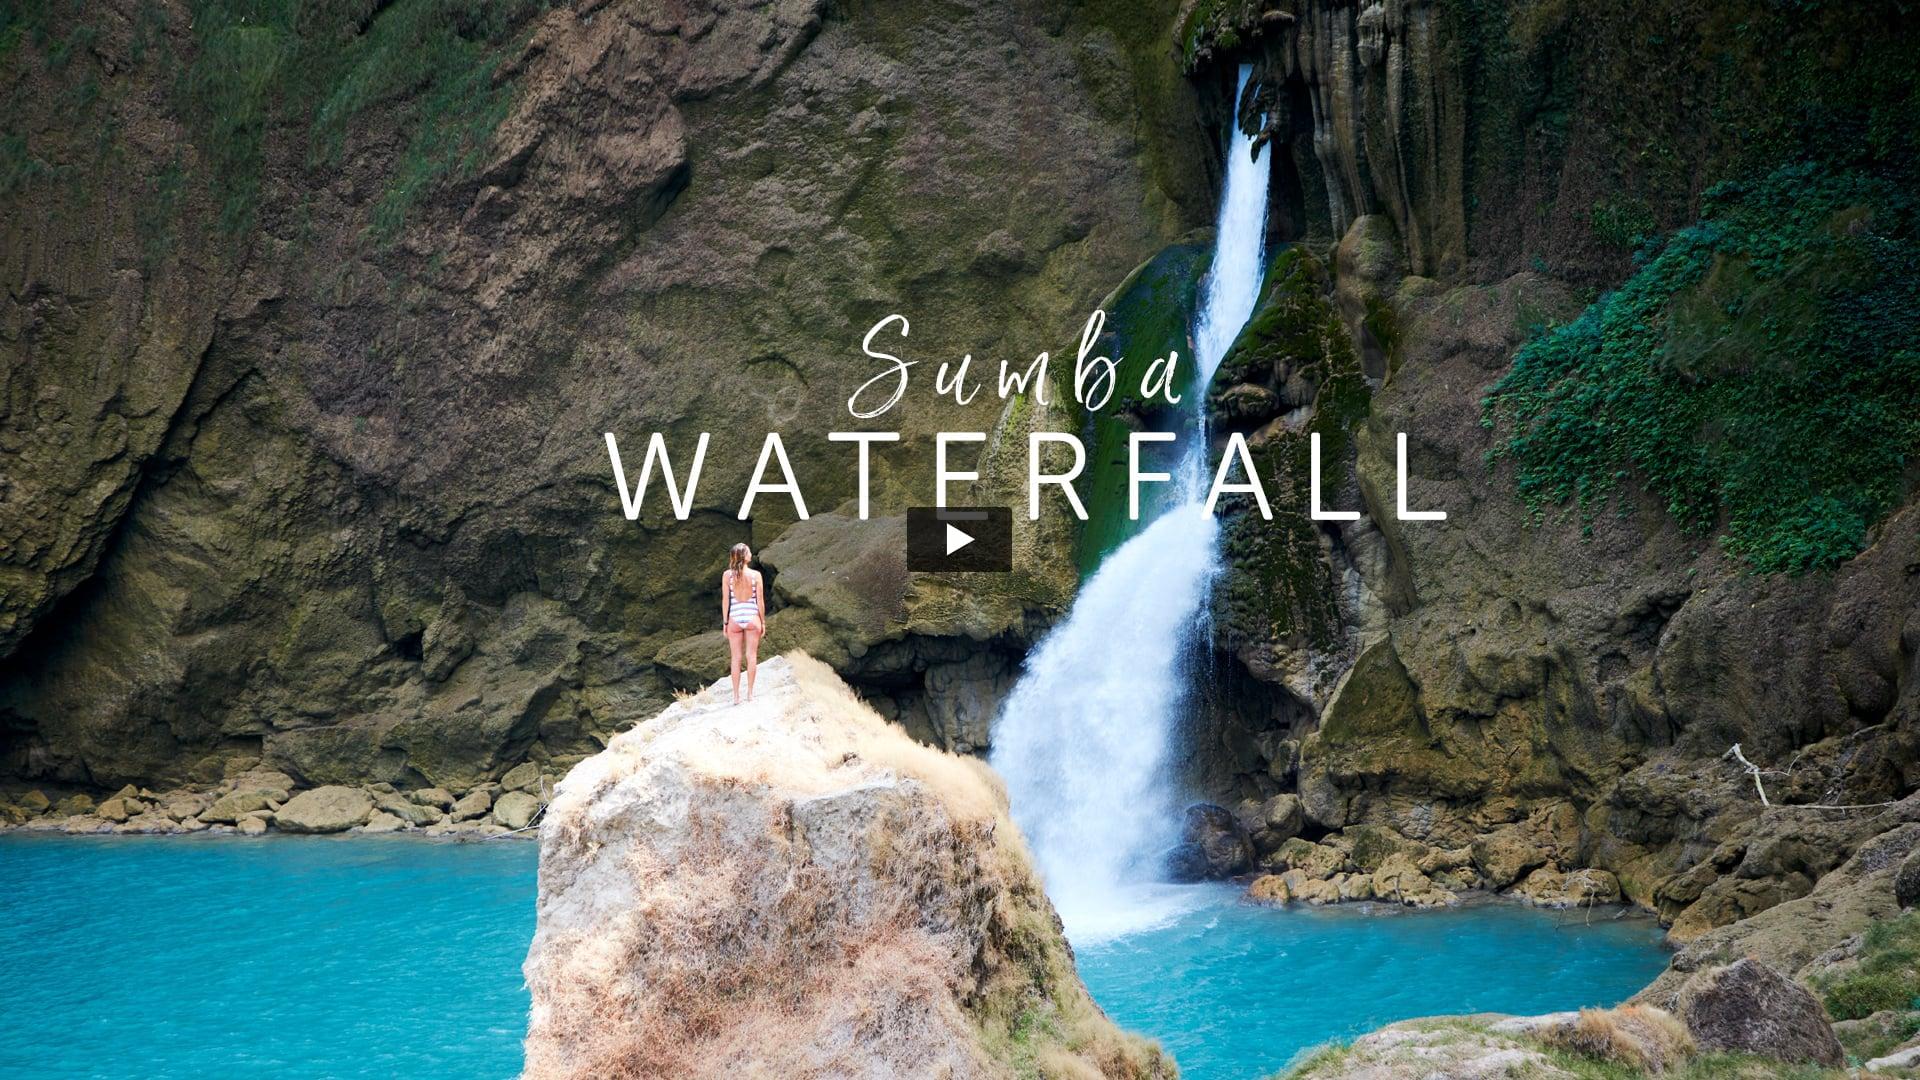 Sumba Waterfall